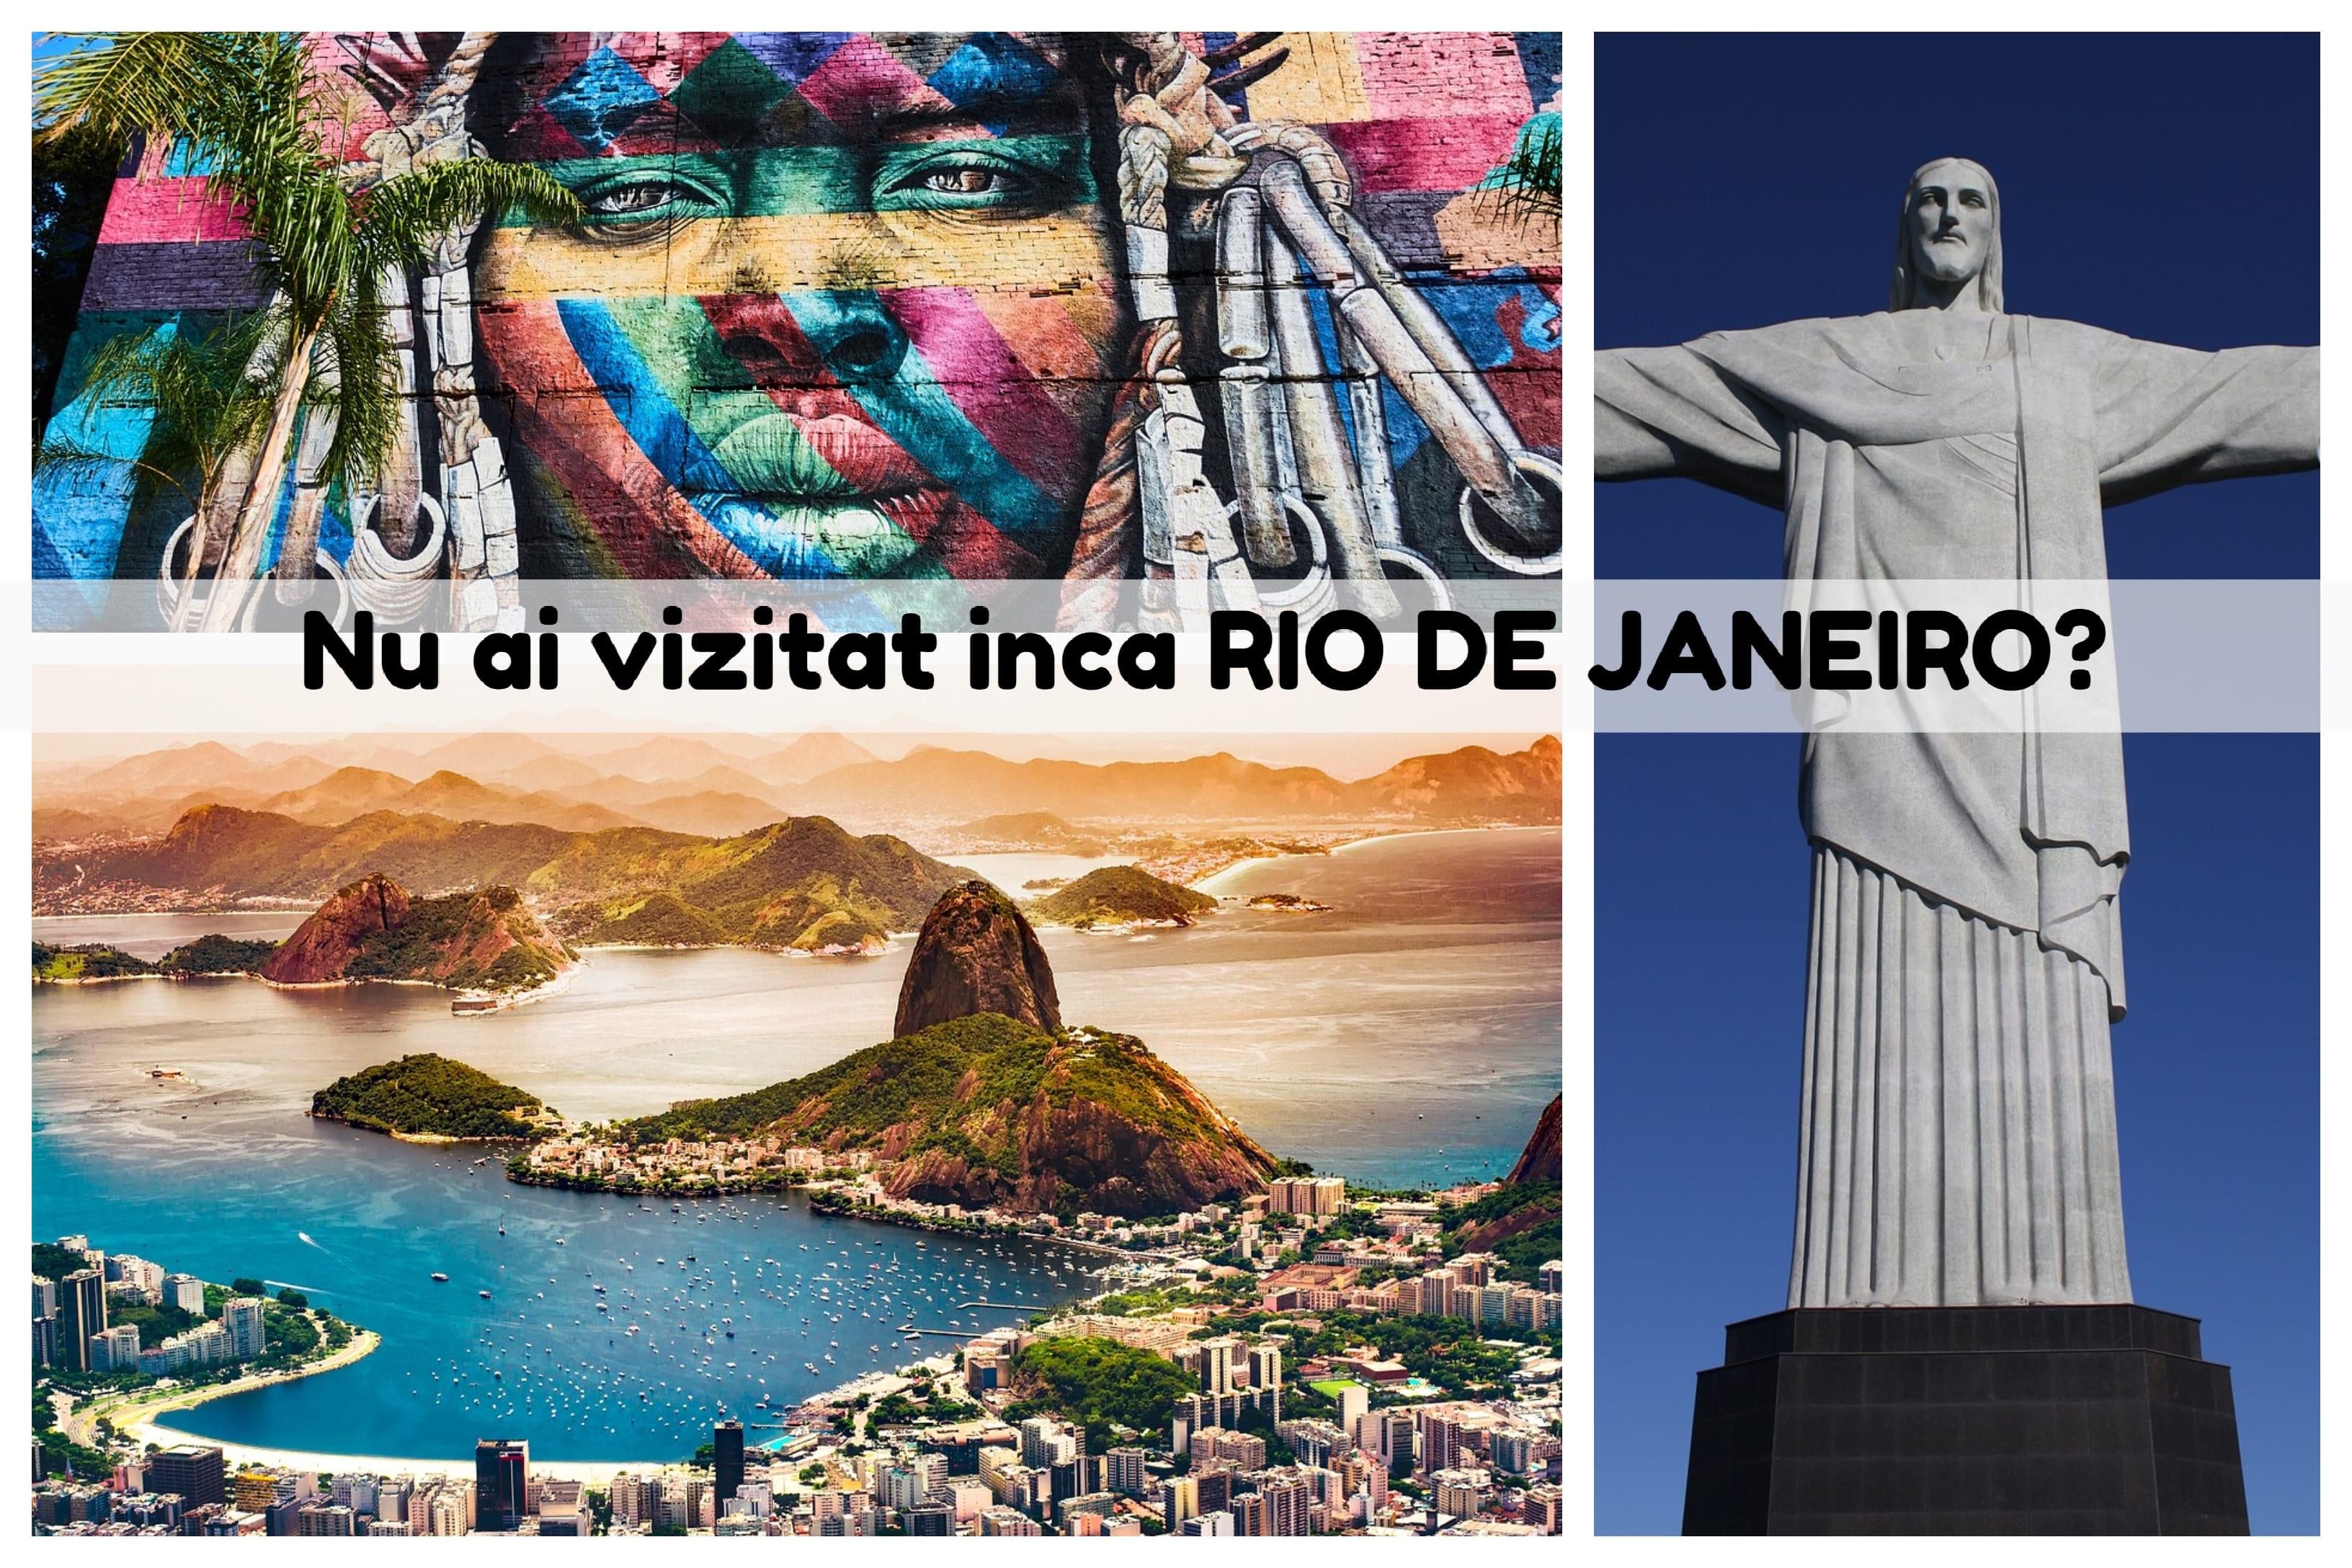 Rio de Janeiro - imagini din Brazilia, destinatie cuprinsa in oferta KLM